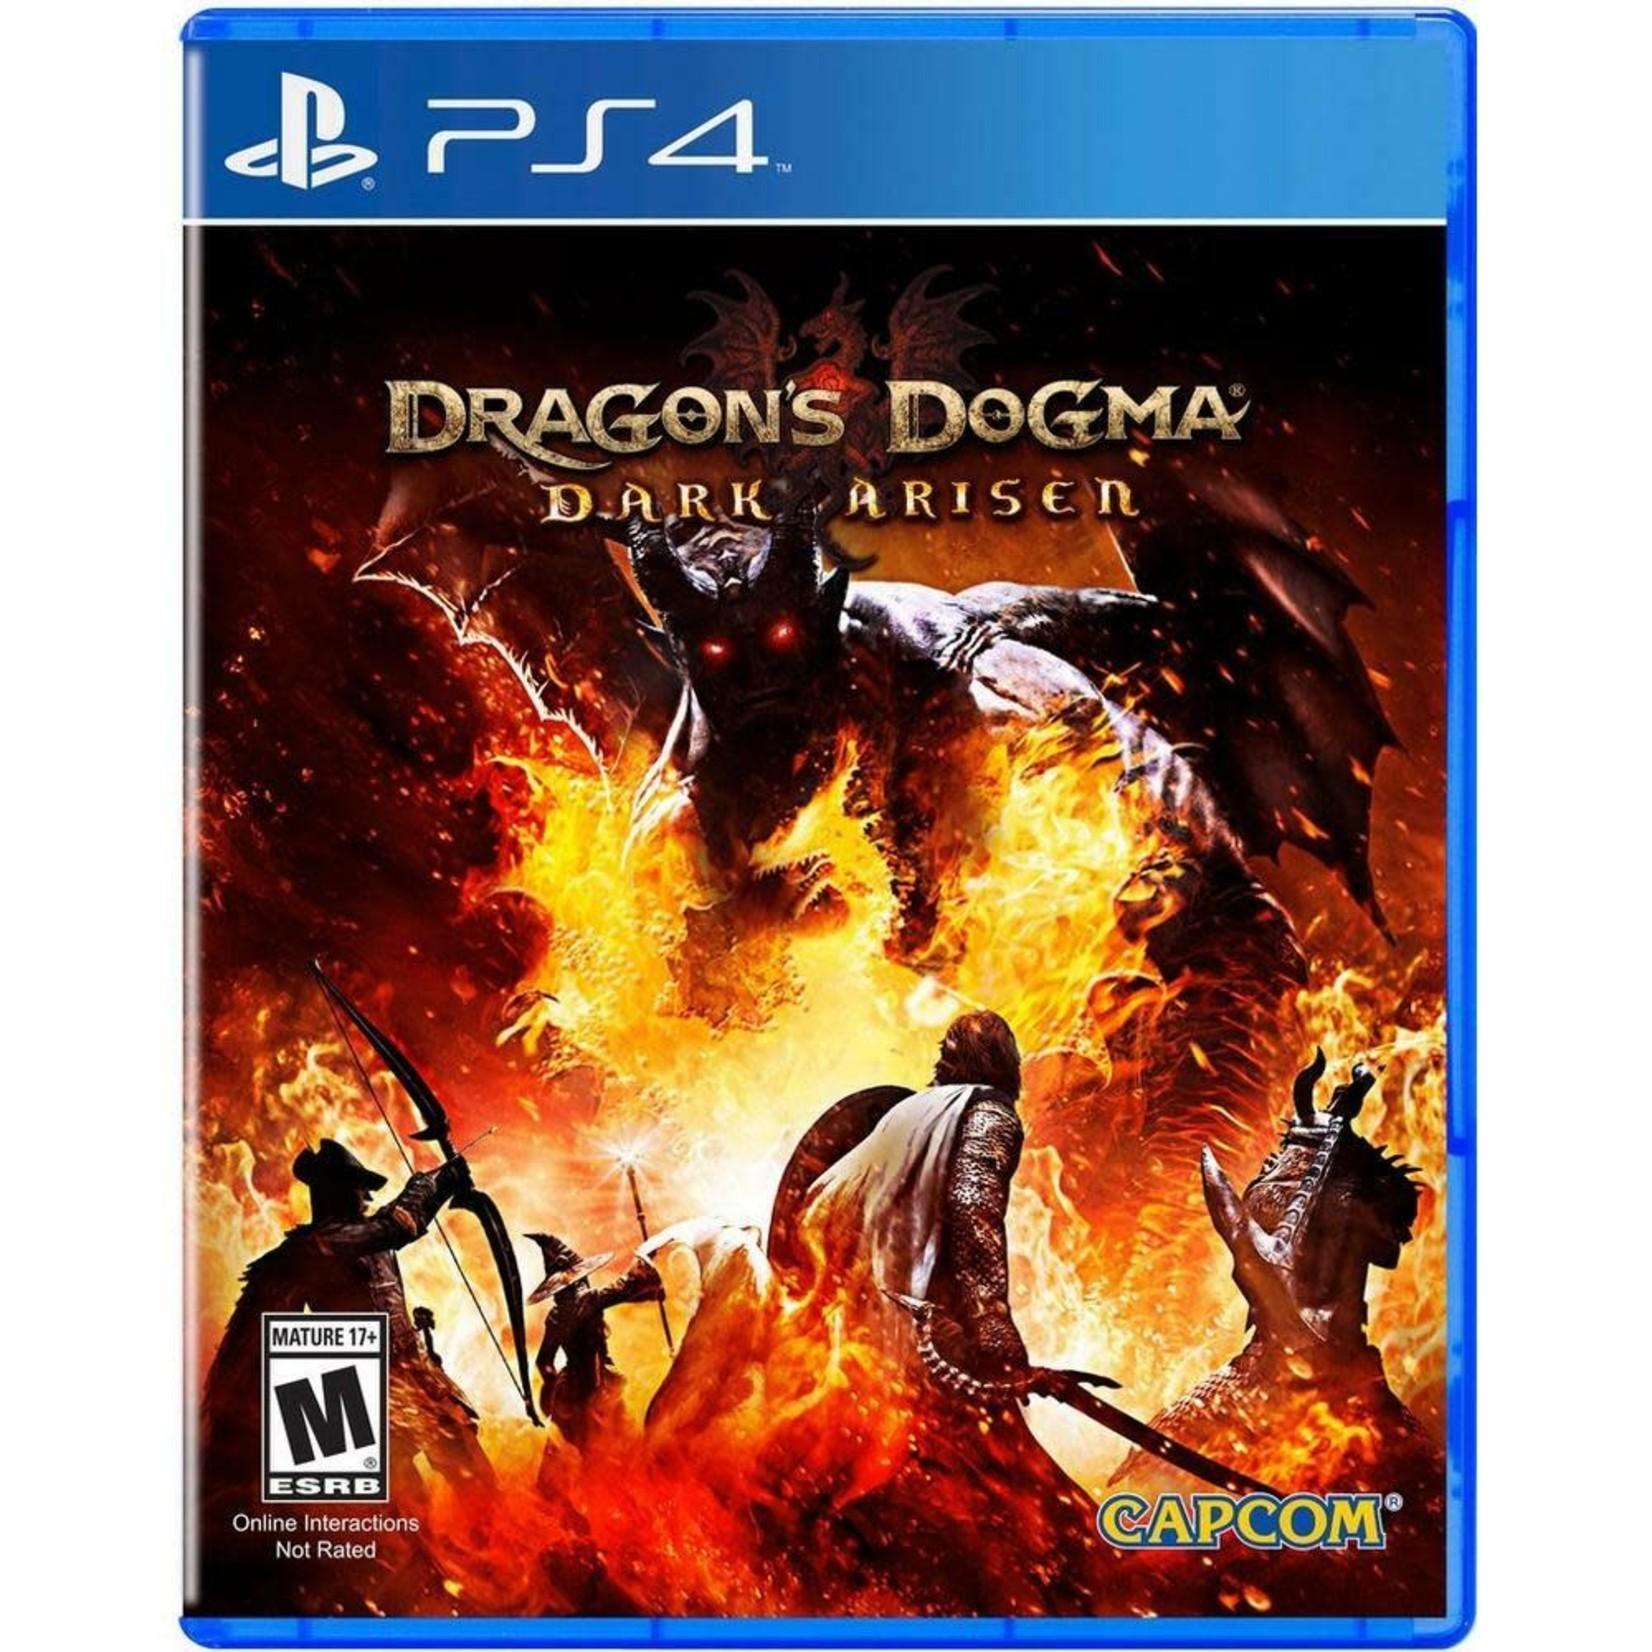 PS4-Dragon's Dogma: Dark Arisen